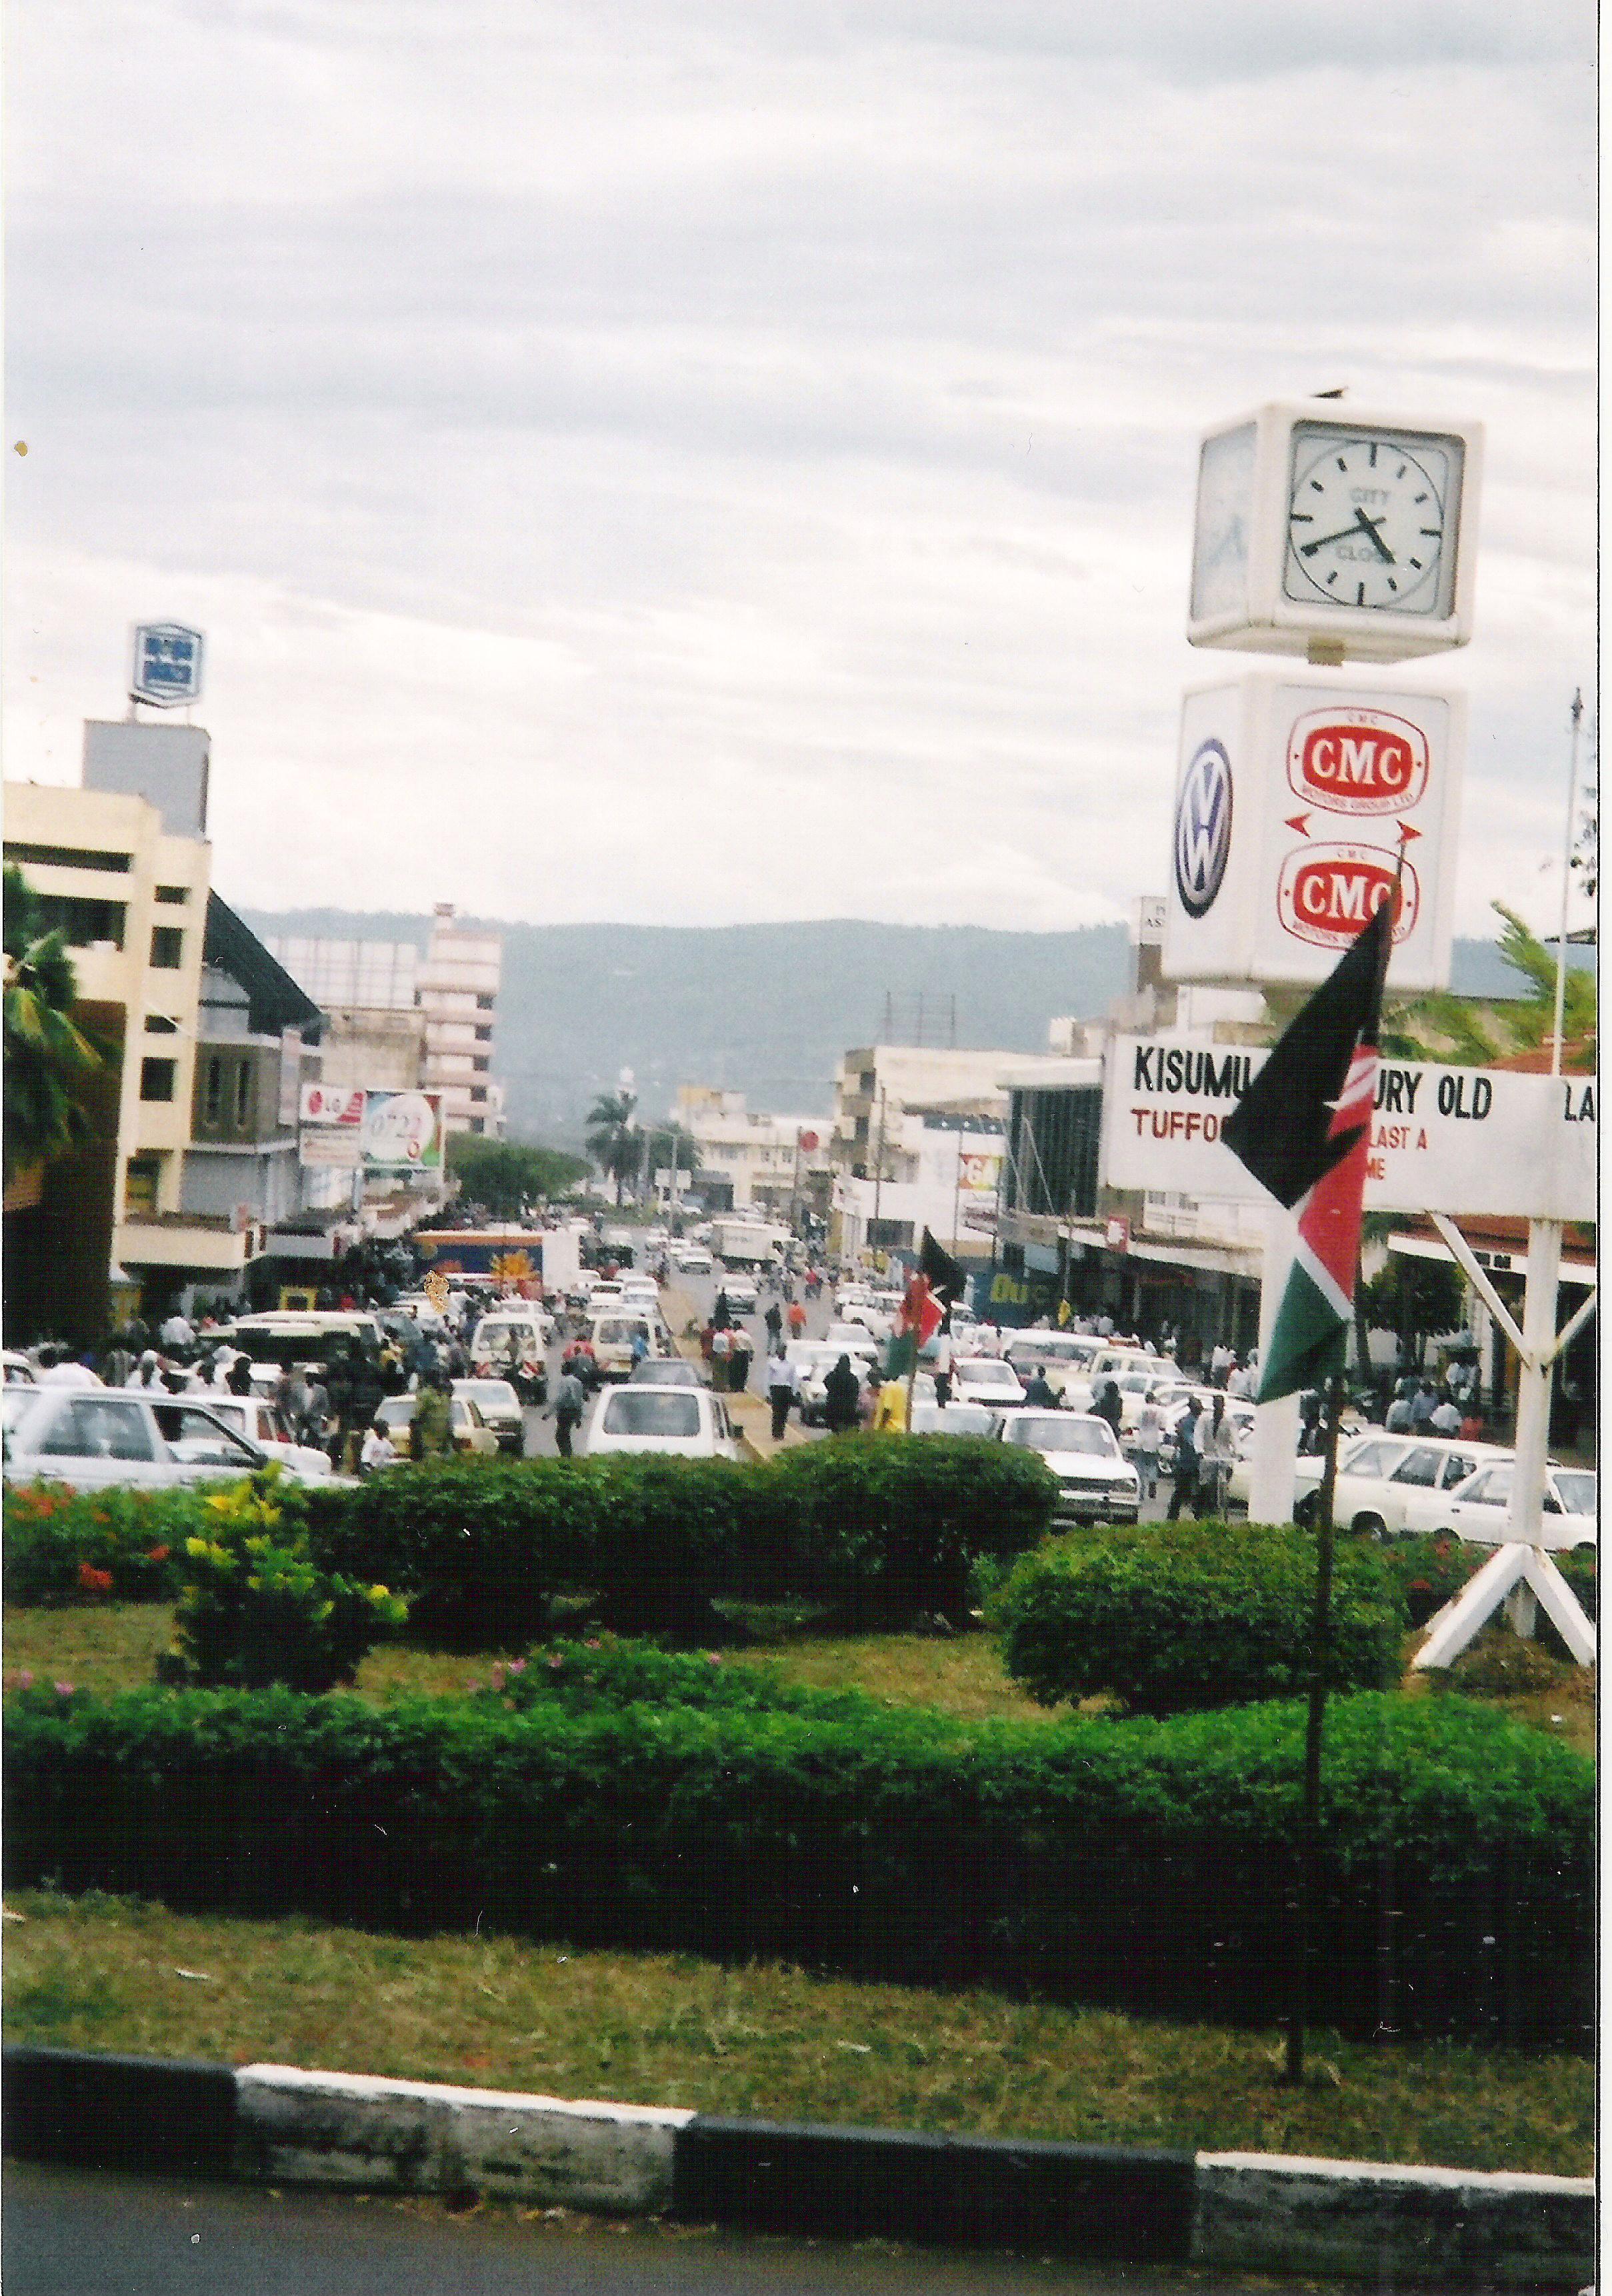 Sites de rencontres gratuits à Kisumu